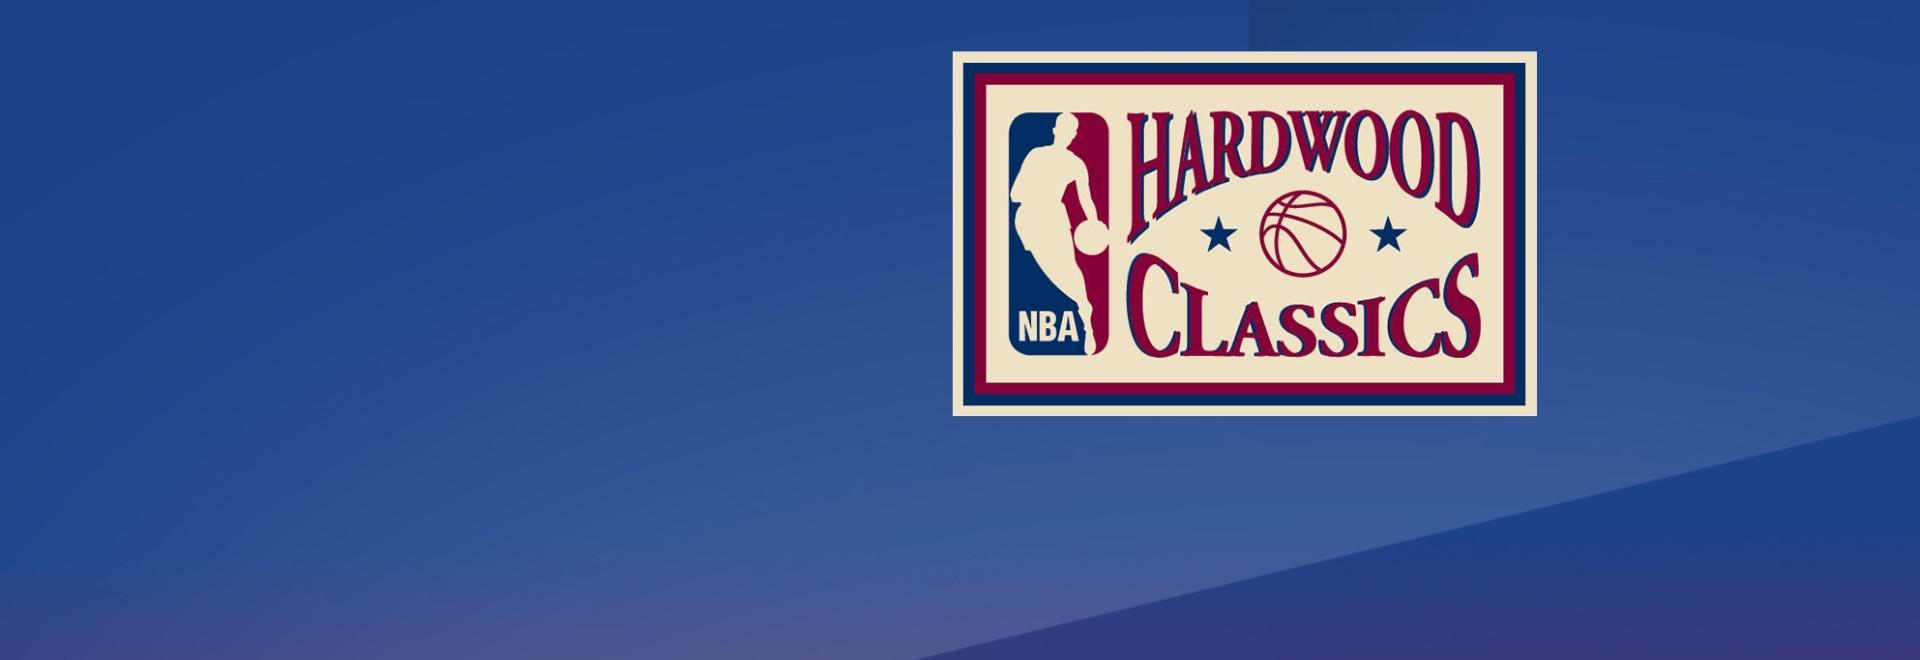 Pistons - Knicks 25/12/87